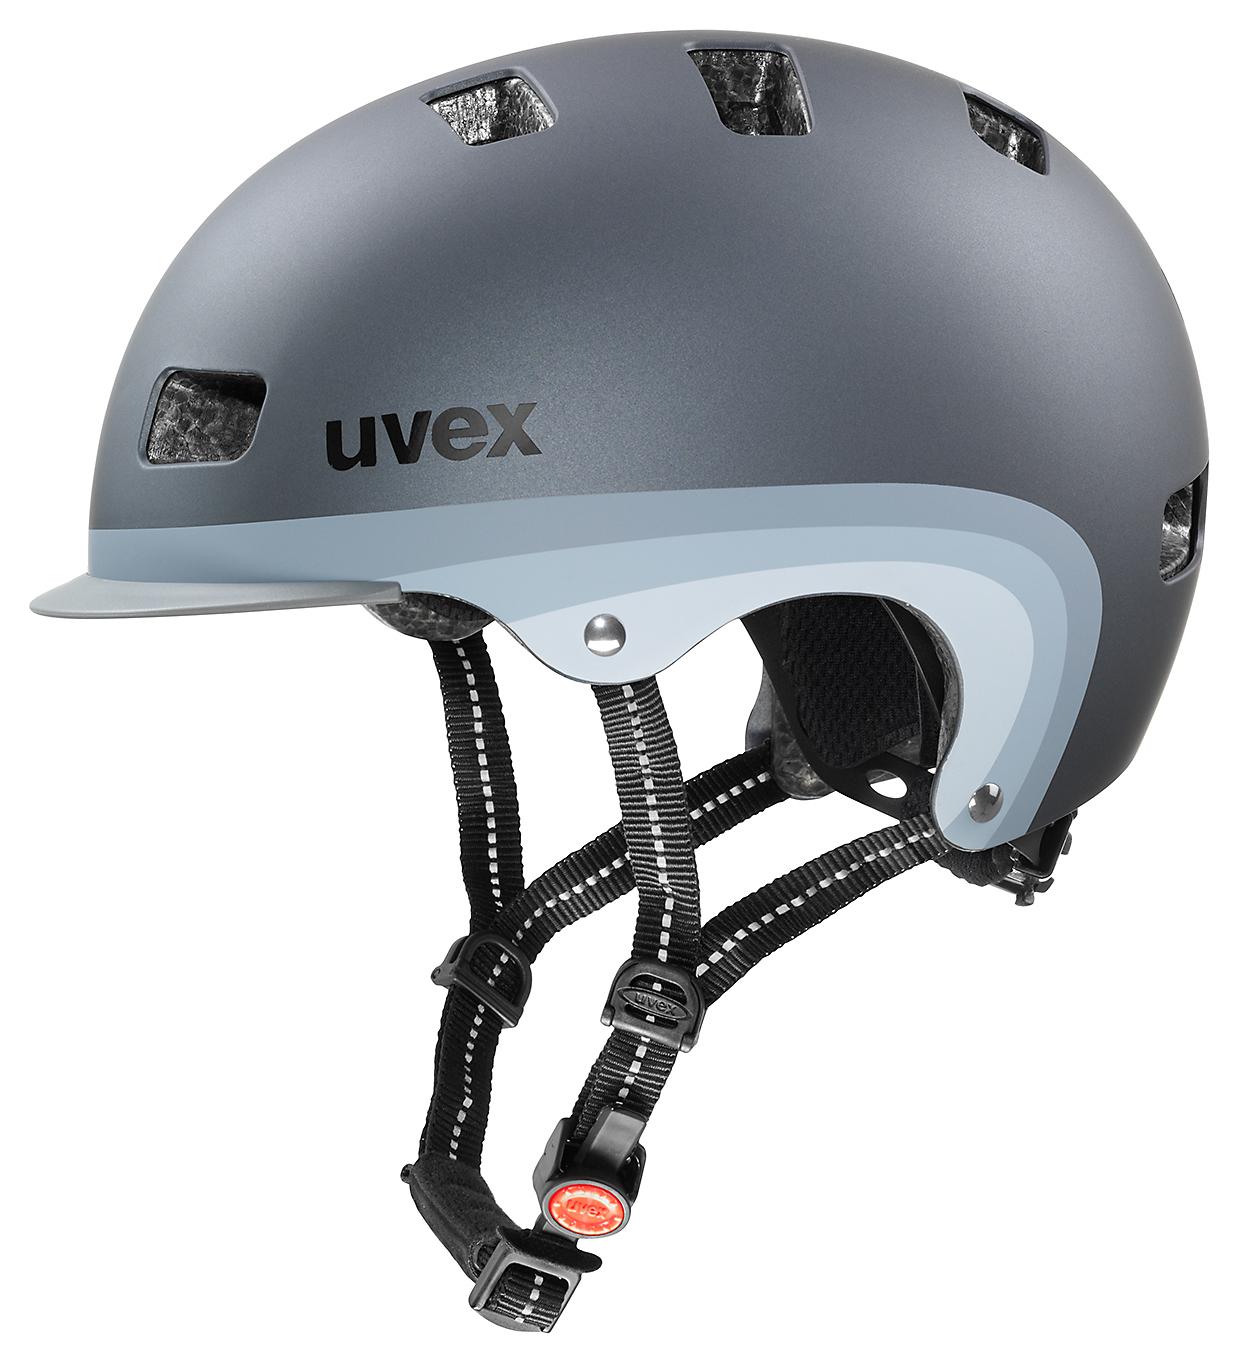 UVEX CITY 5, DARK SILVER METALLIC MAT 2015 55-58 cm